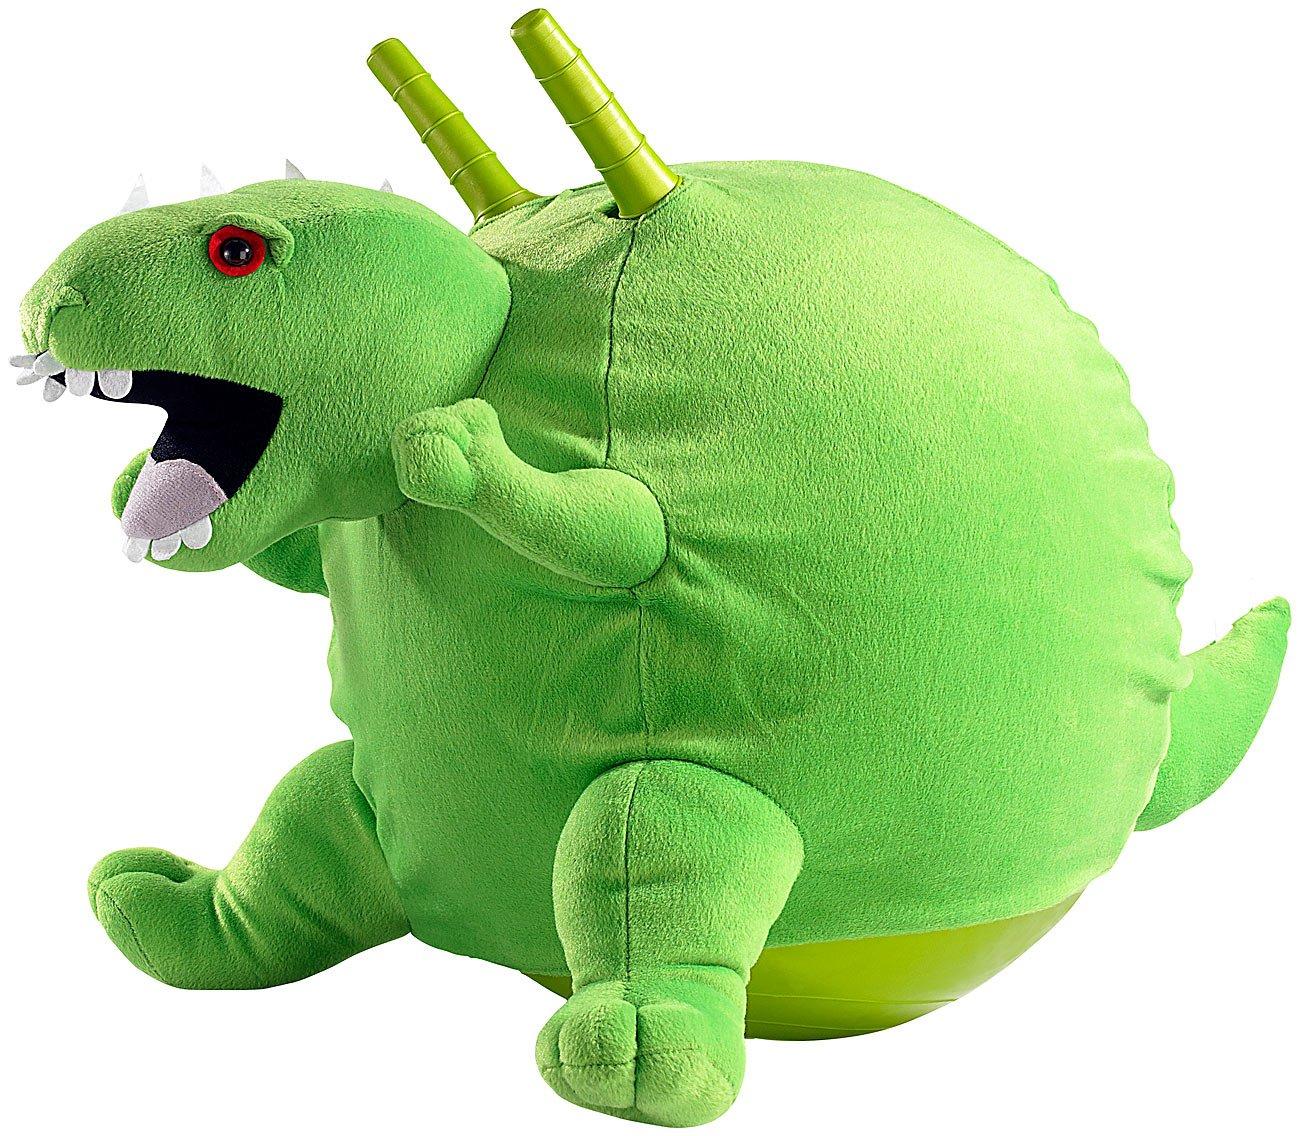 Playtastic Bälle: Knallgrüner Dinosaurier-Hüpfball mit Flauschbezug, 45 cm (Jumpball)